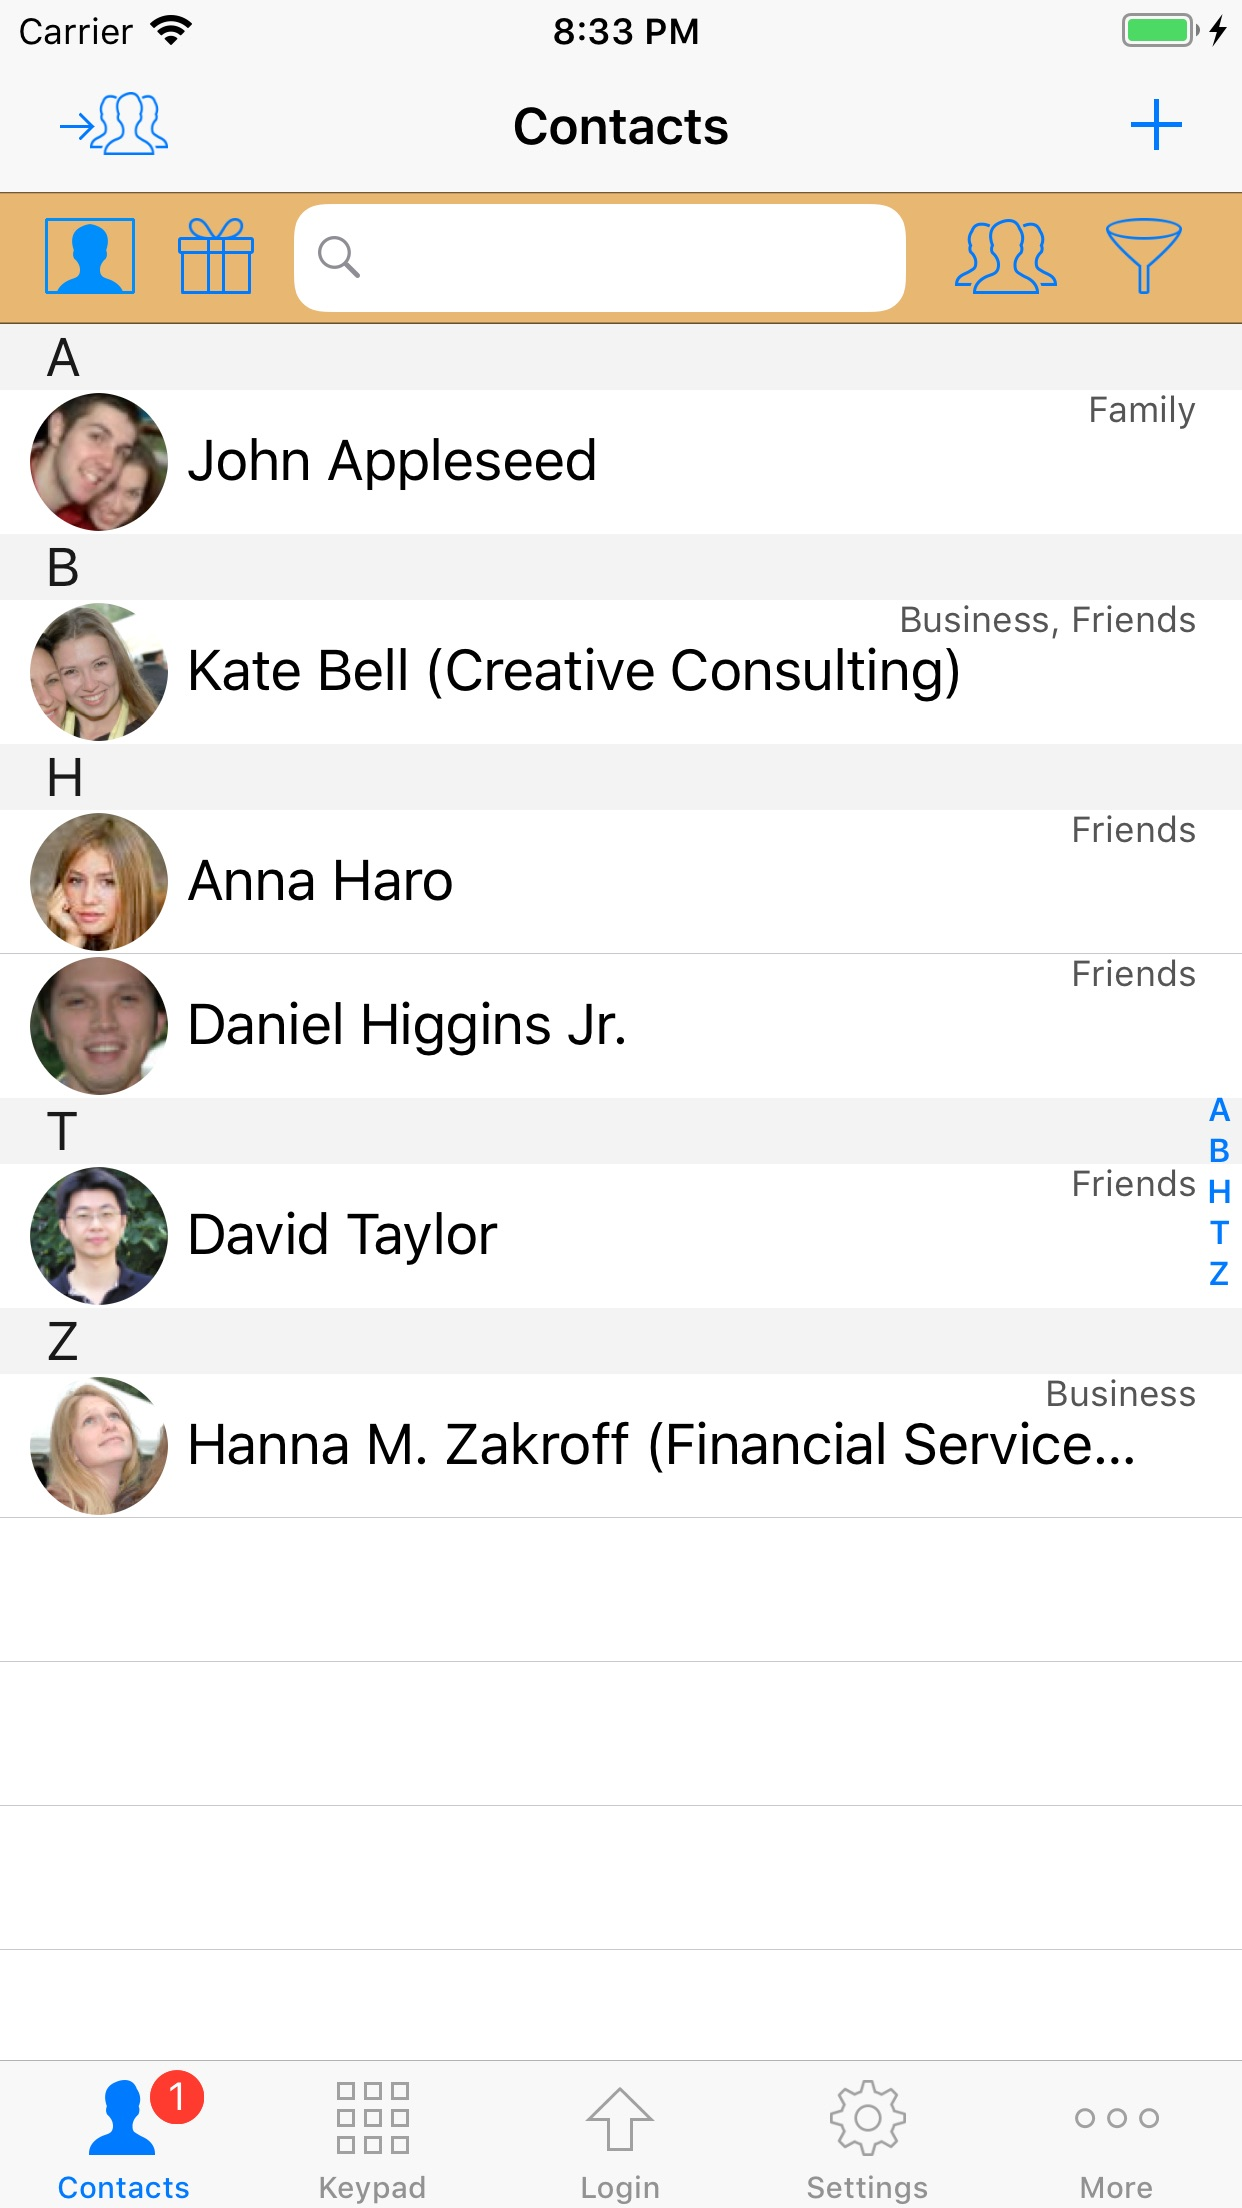 ContactsPro for iPad Screenshot